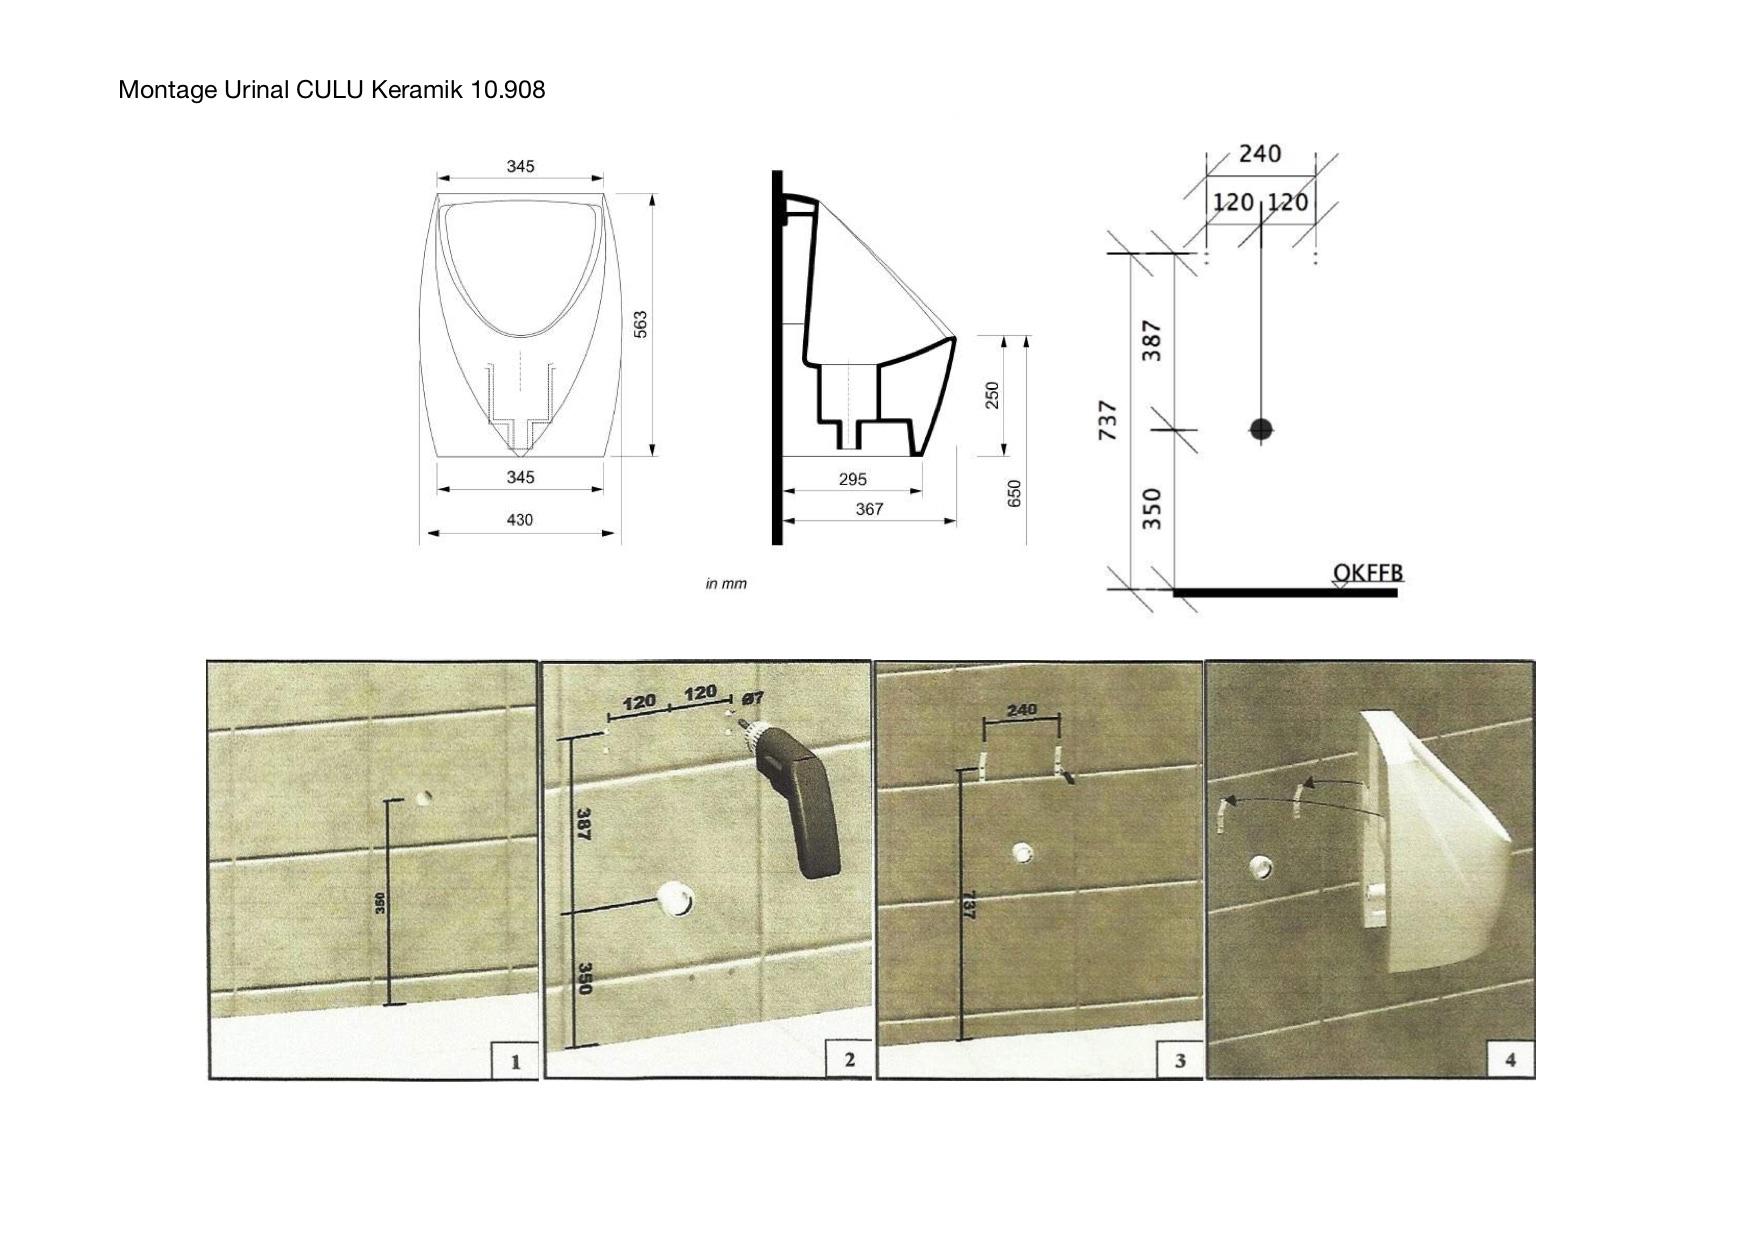 Montageanleitung CULU Urinal 10908